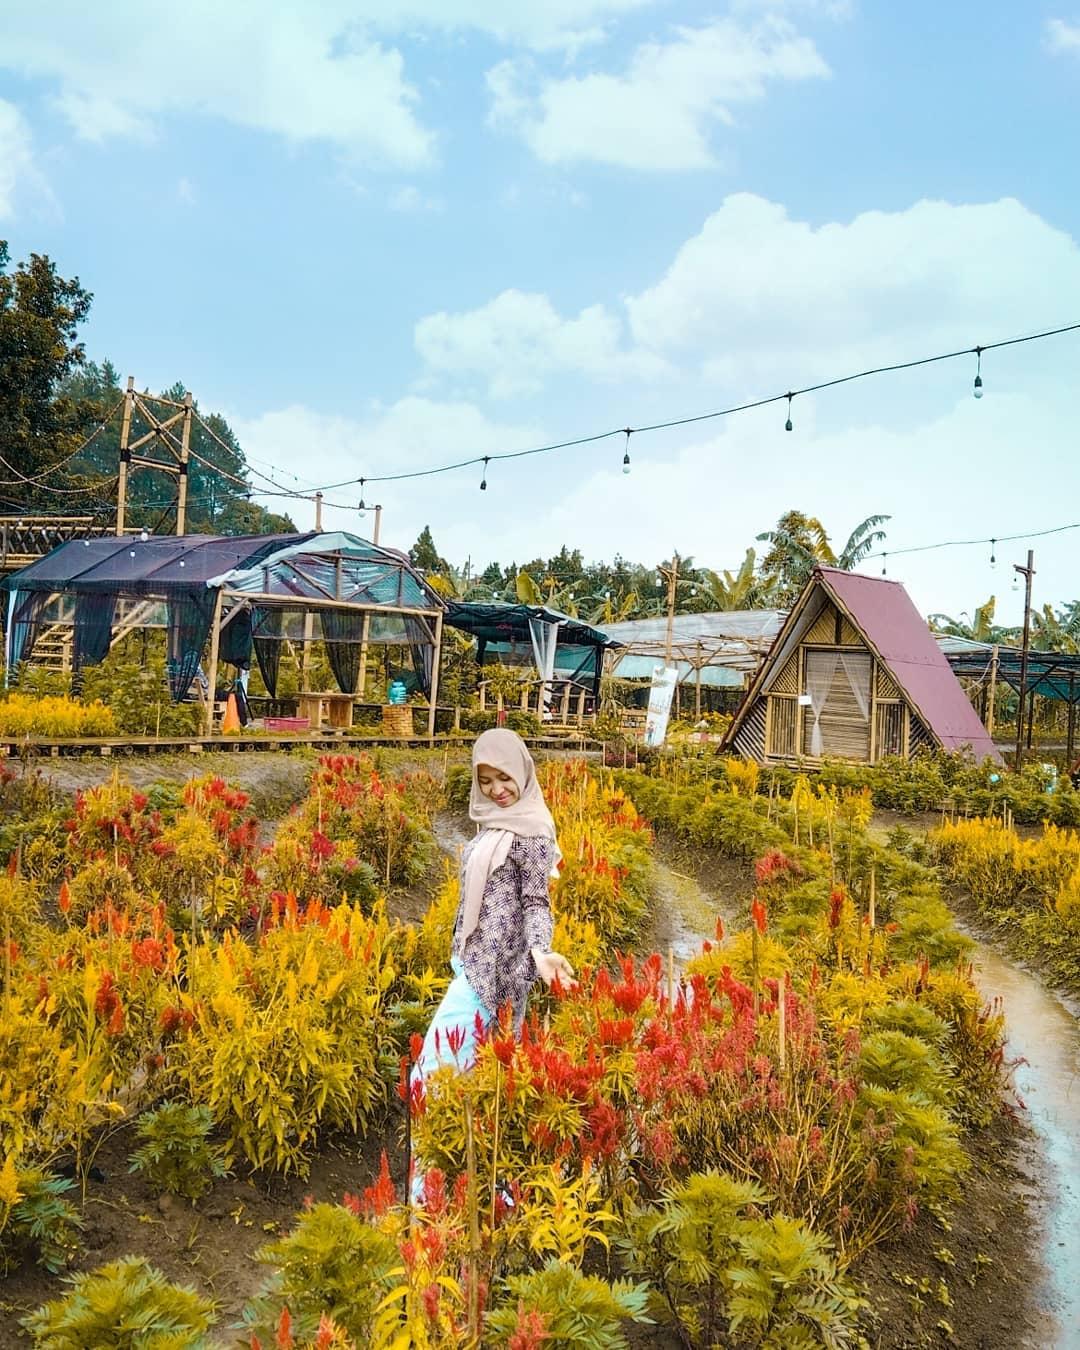 Bunga Di Tapos Garden Image From @rizkadewif